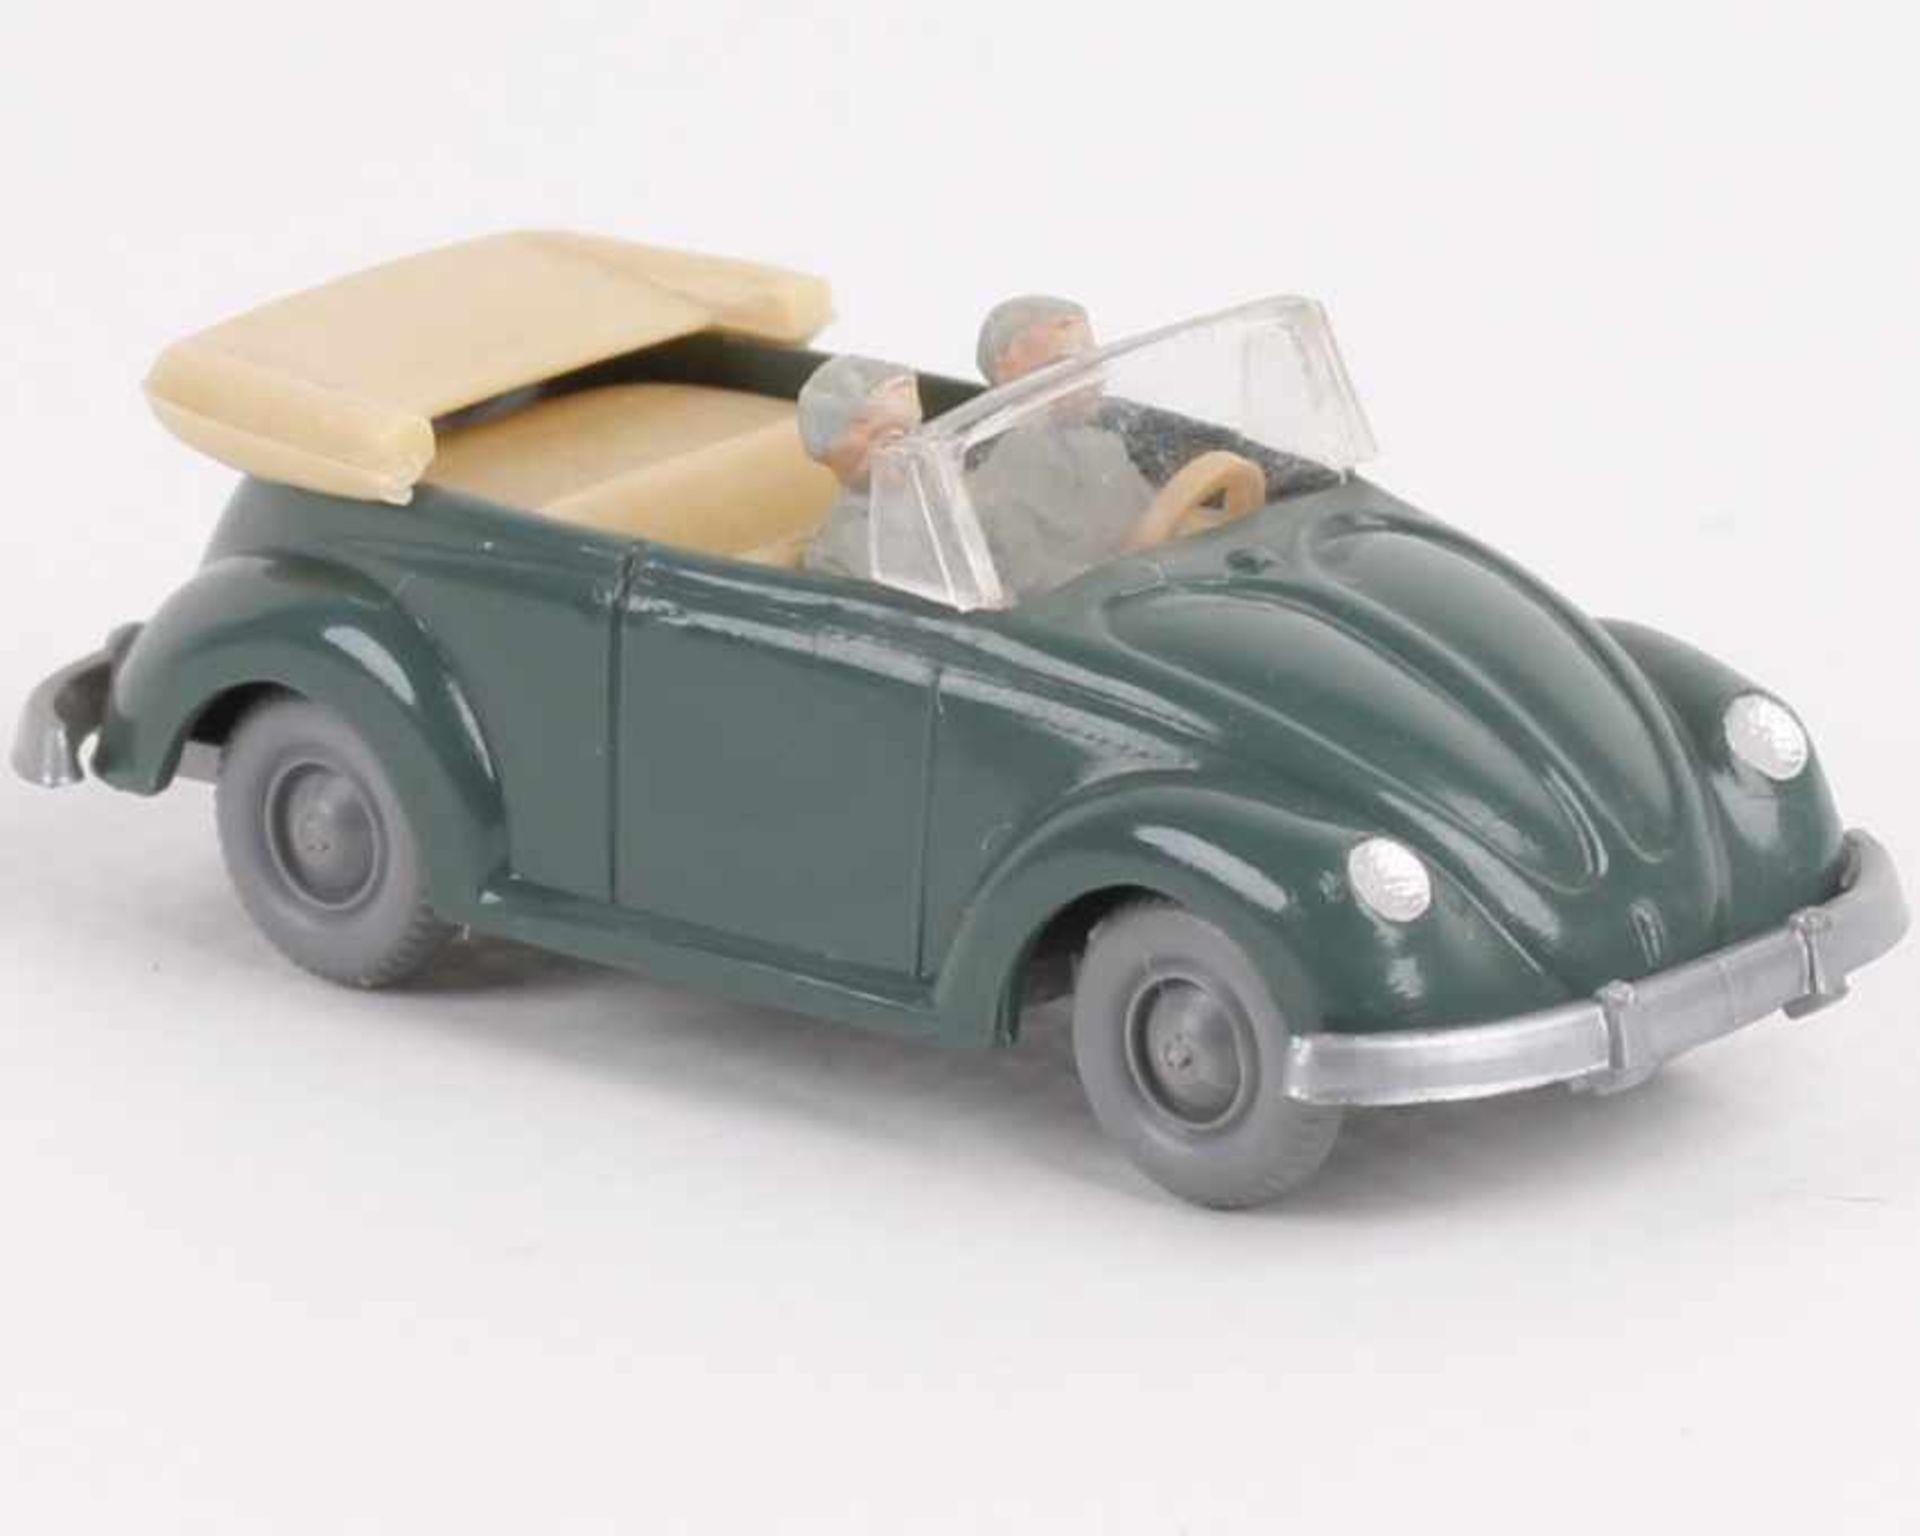 Los 1004 - WikingVW Käfer Cabrio h'patinagrün33/6x, IE h'beige, neuwertig